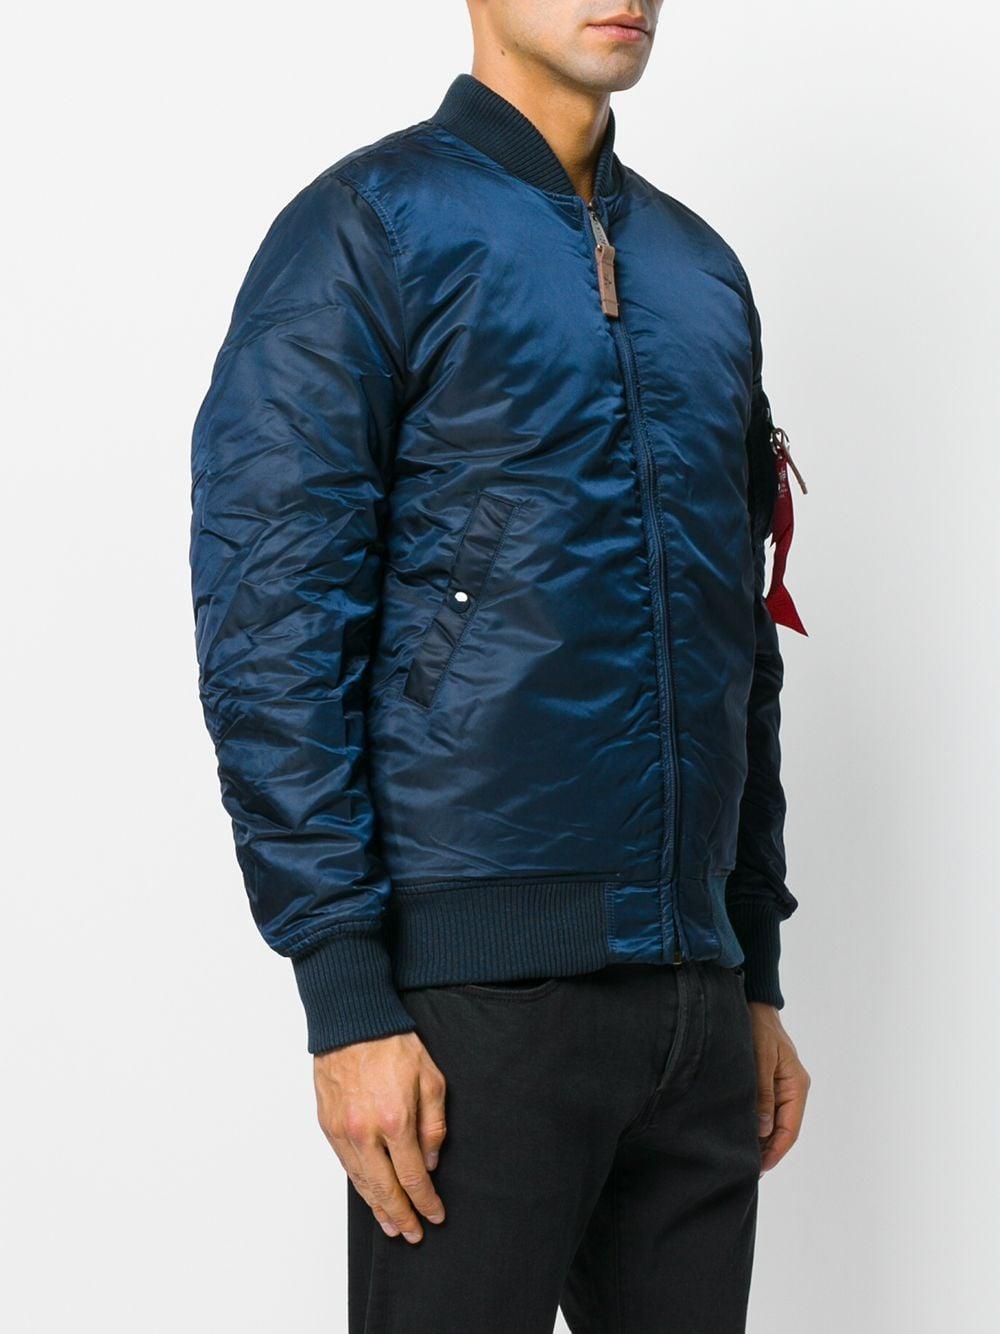 giacca ma1 vf 59 long uomo blu ALPHA INDUSTRIES | Giacche | 16810007